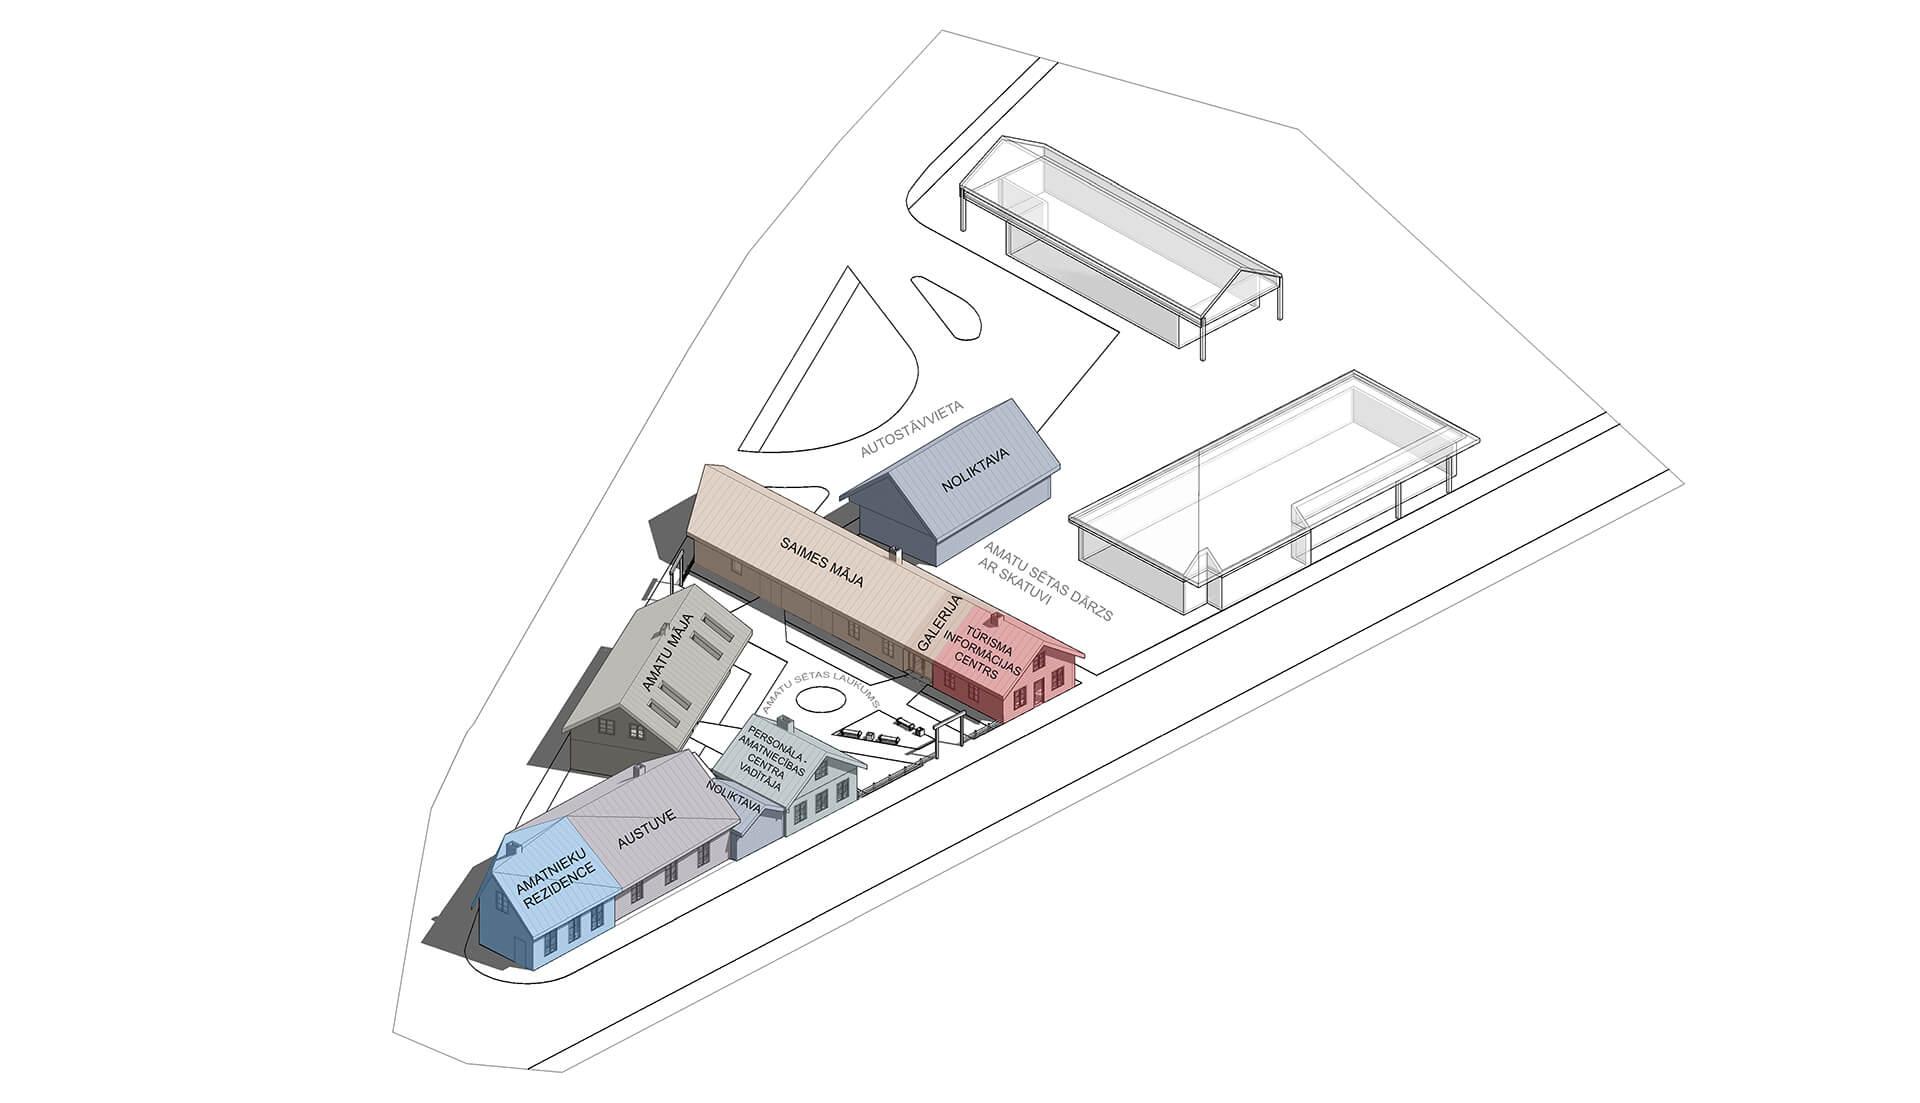 https://laagaarchitects.lv/wp-content/uploads/2019/11/03-04-1-Ruuj.jpg